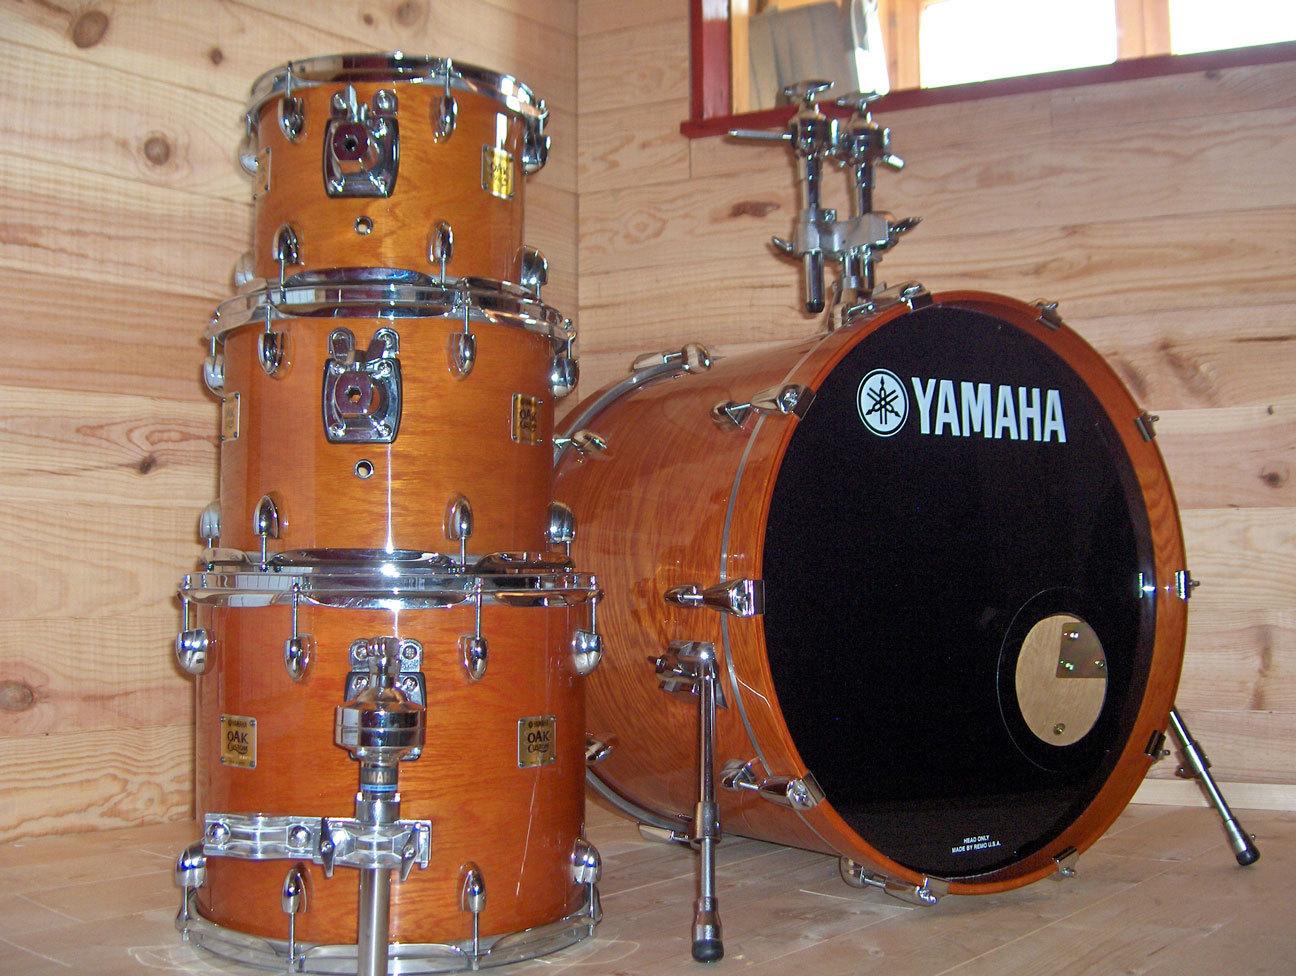 yamaha oak custom image 119512 audiofanzine. Black Bedroom Furniture Sets. Home Design Ideas